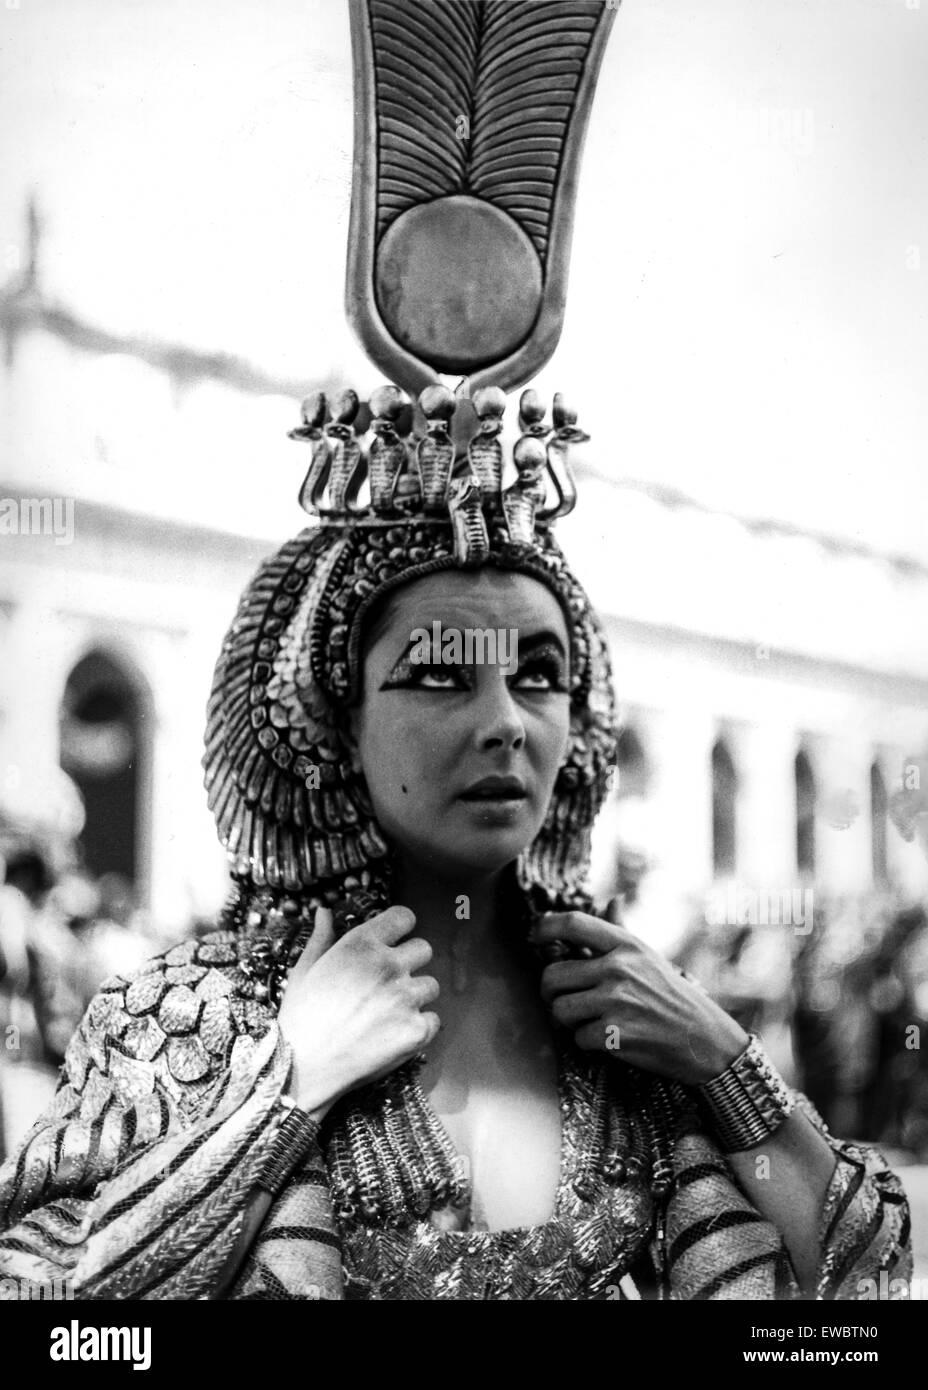 liz taylor in cleopatra,1962 - Stock Image